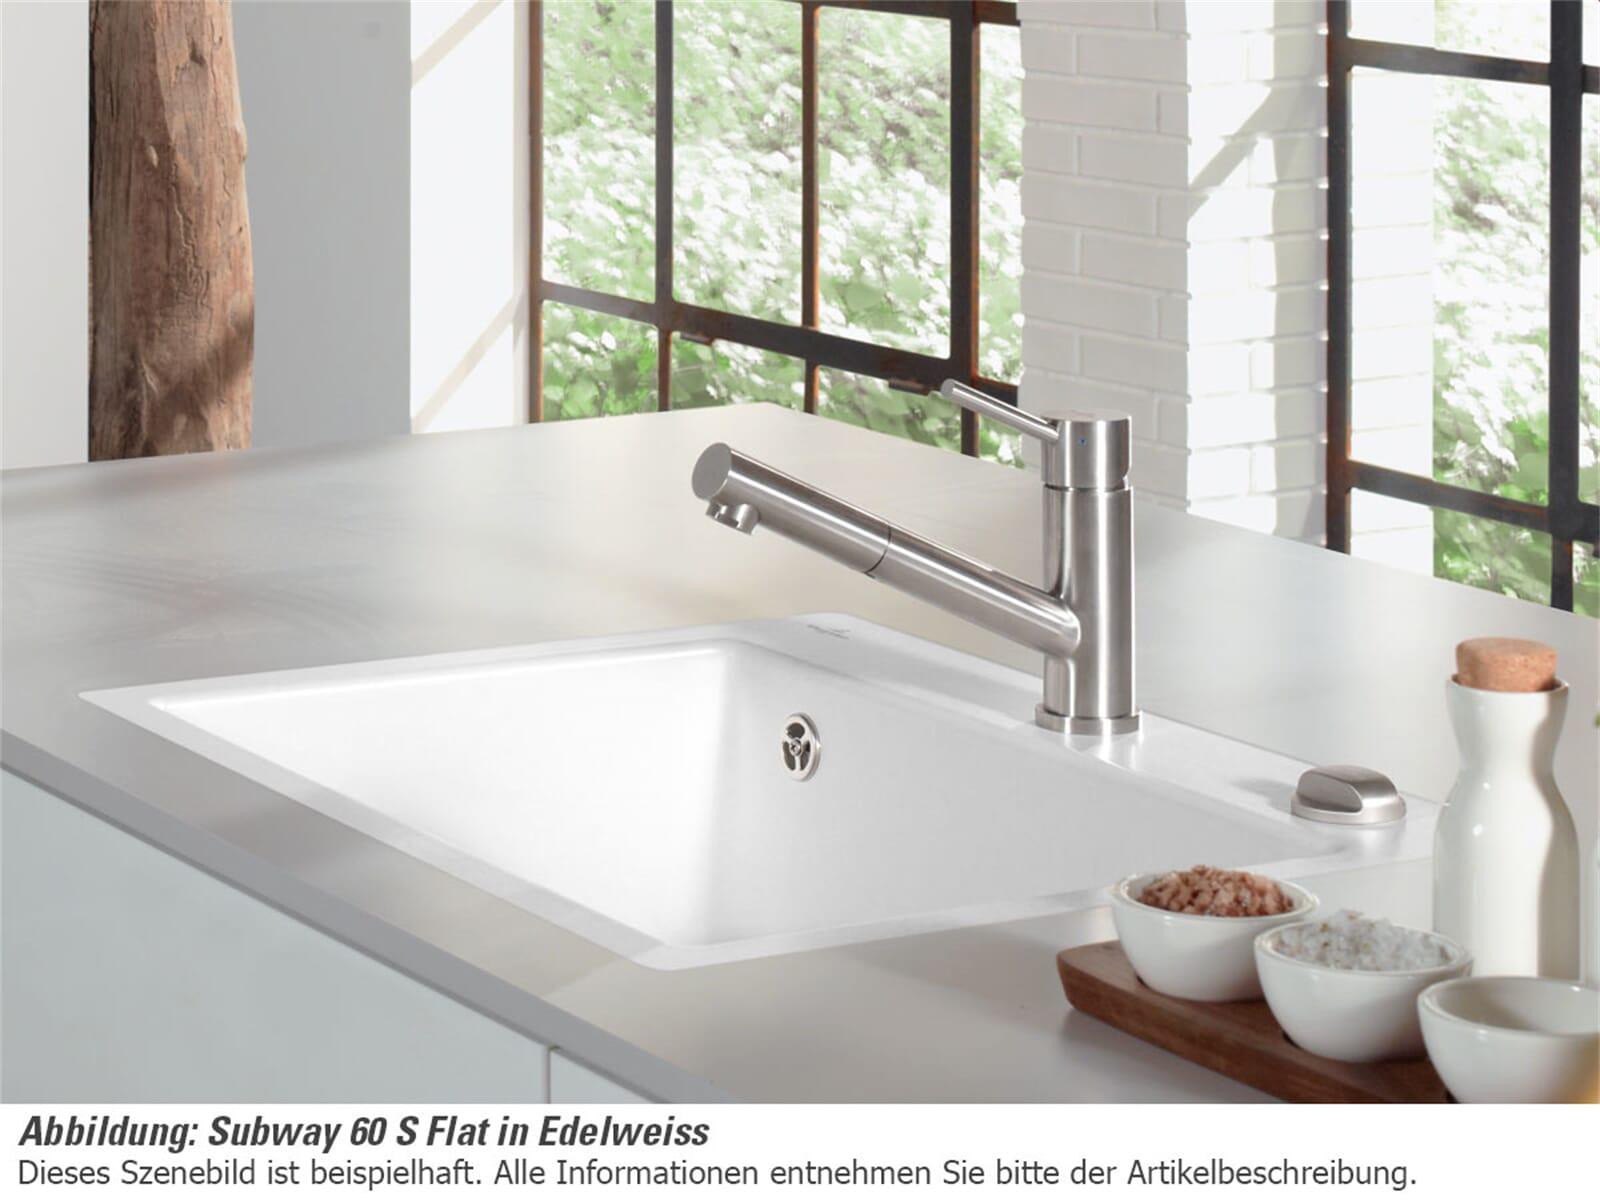 Villeroy & Boch Subway 60 S Flat Ebony - 3309 2F S5 Keramikspüle   {Spülbecken keramik villeroy & boch 81}